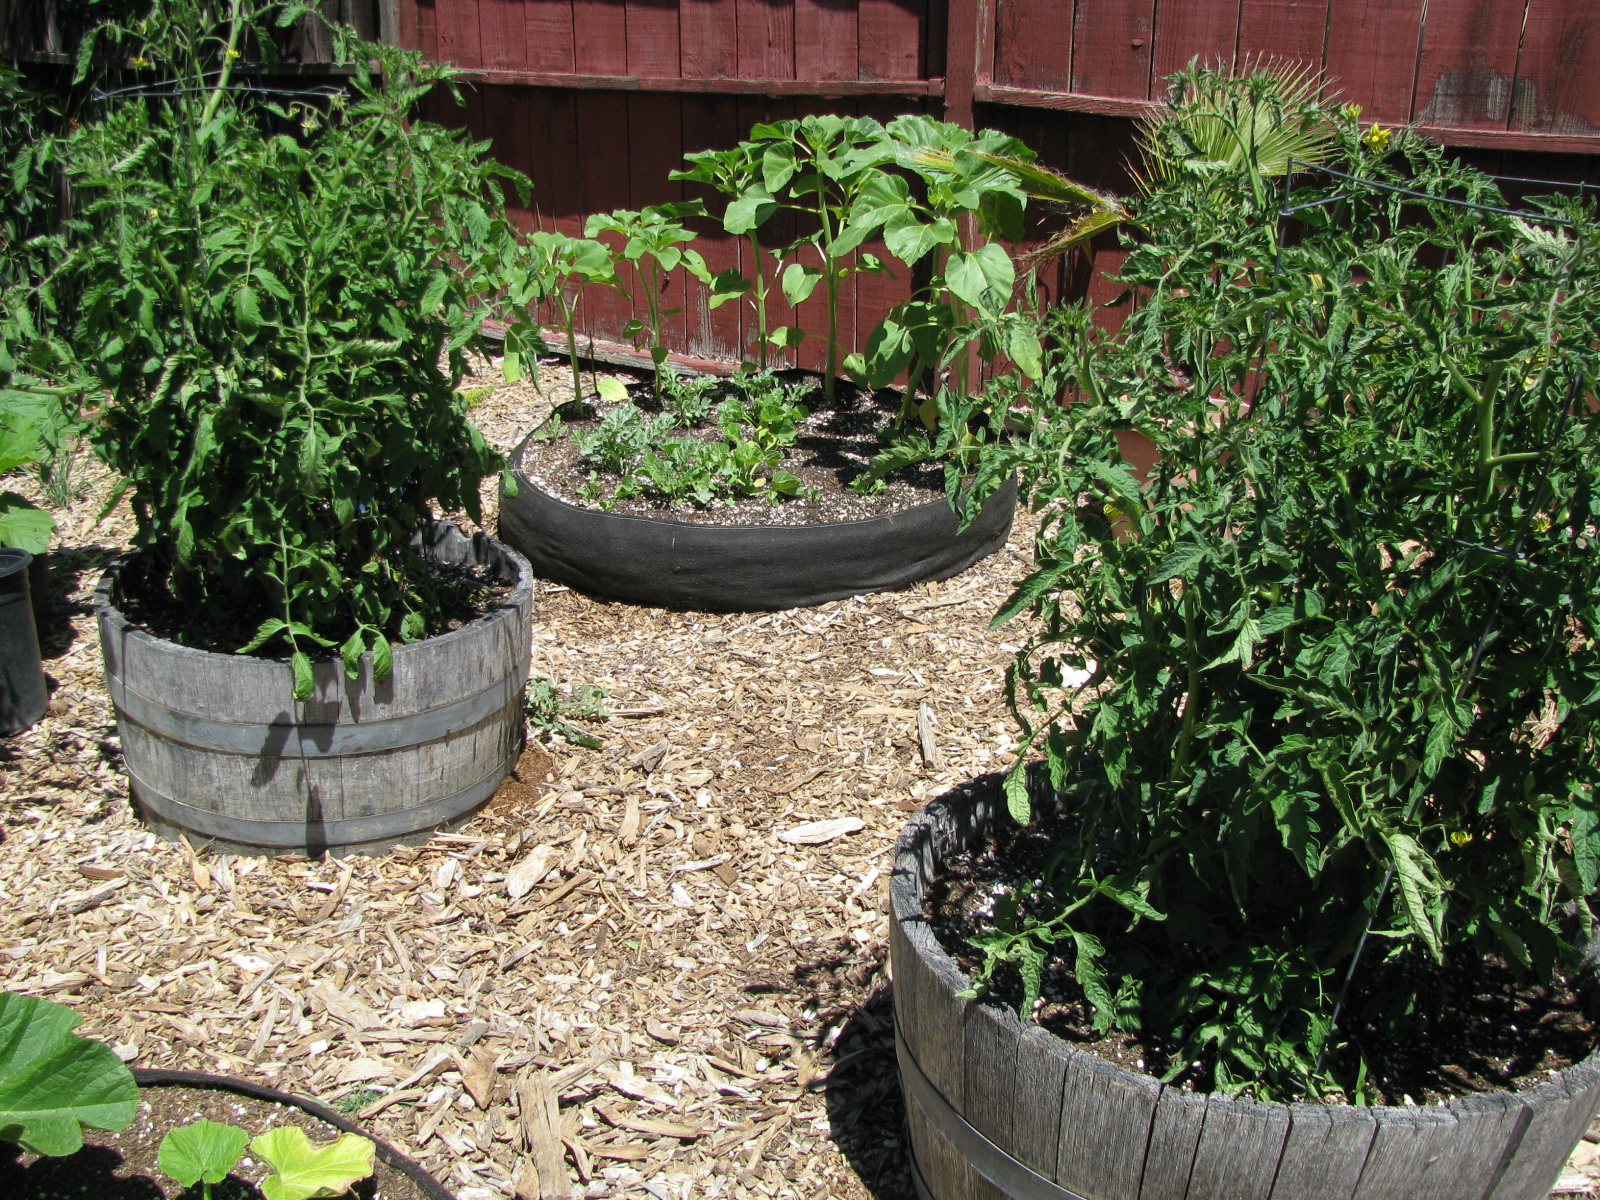 Landscape Fabric Garden Bed U2013 Izvipi.com